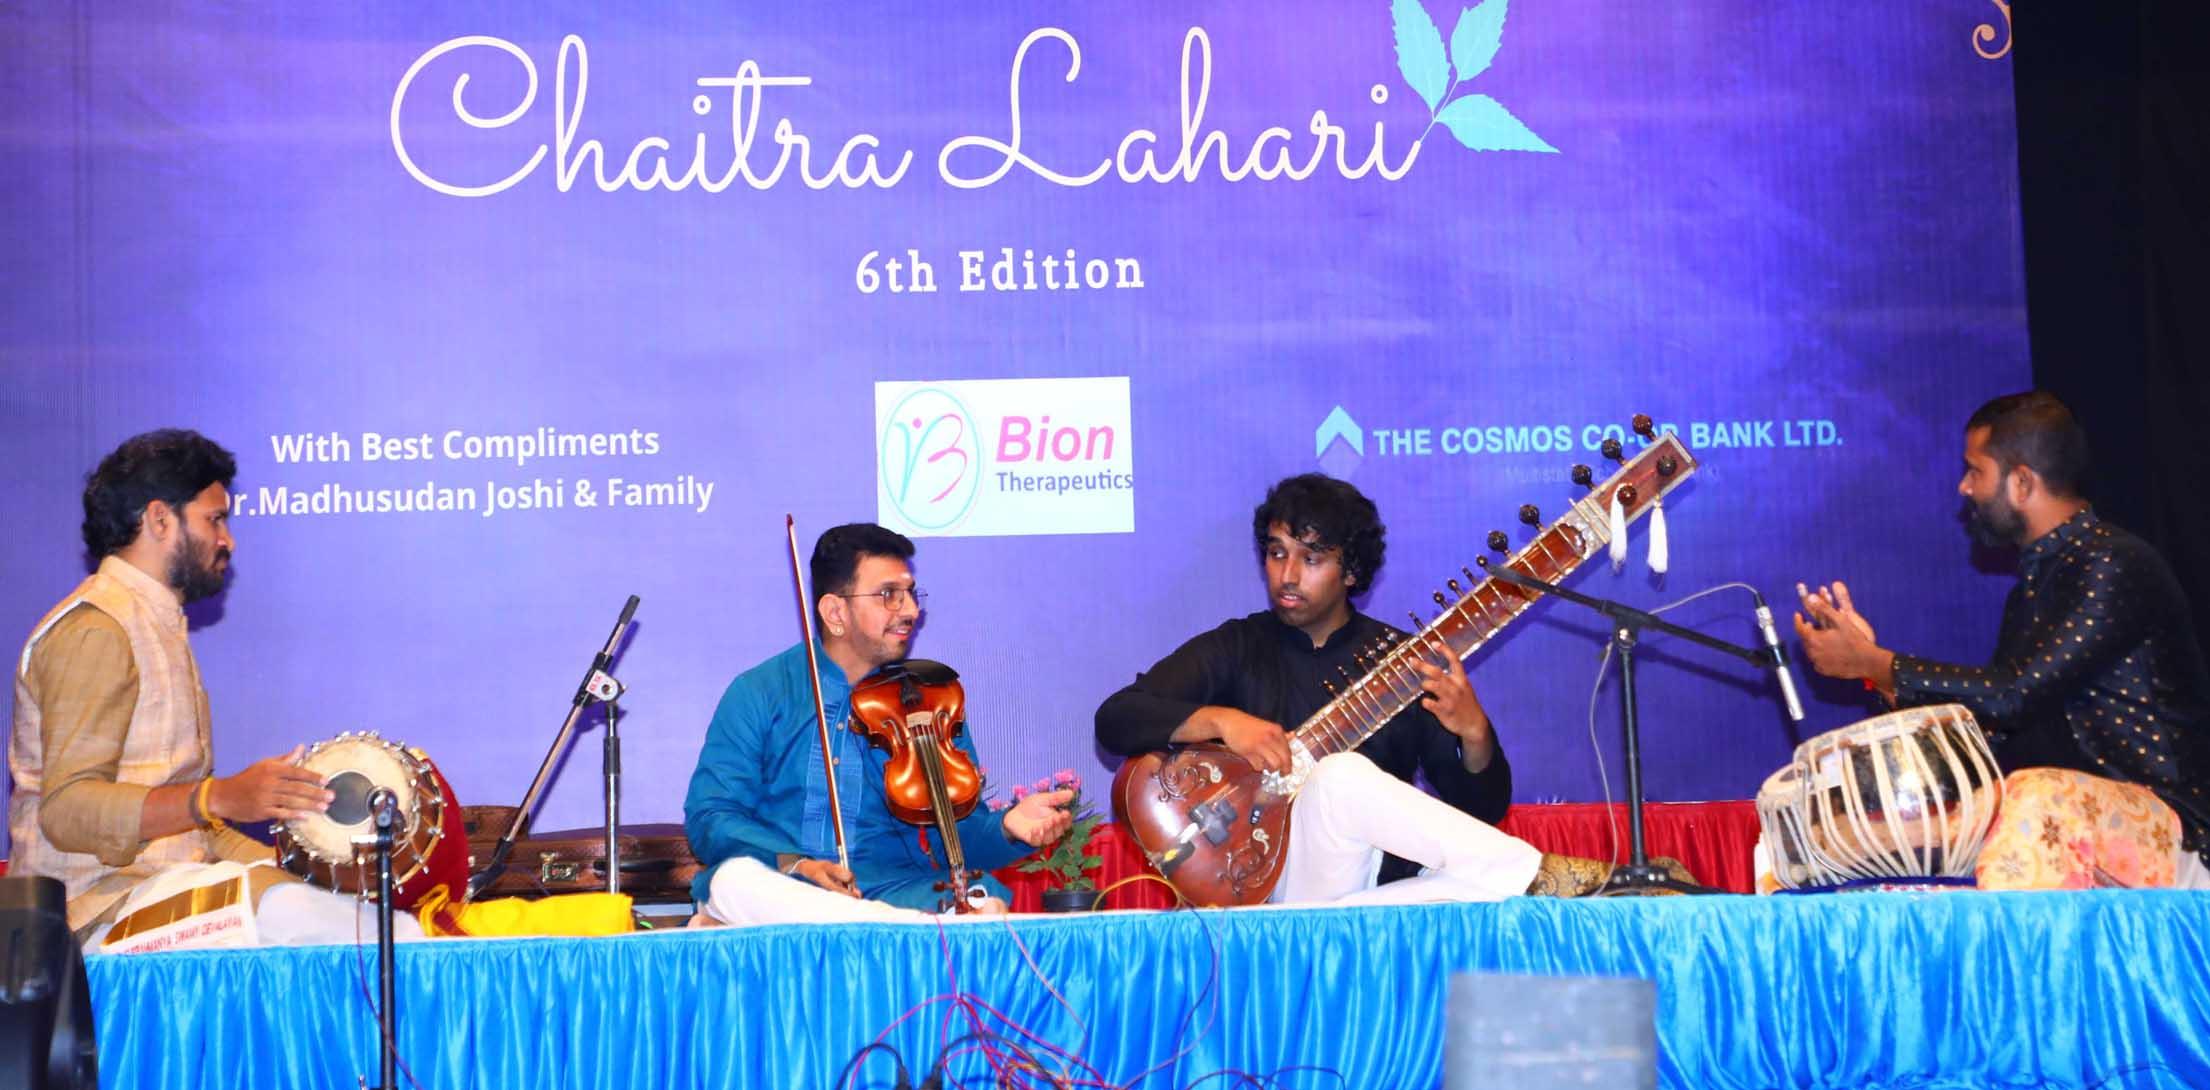 Chaitra Lahari featuring three performances held Sunday night at Ravindra Bharathi